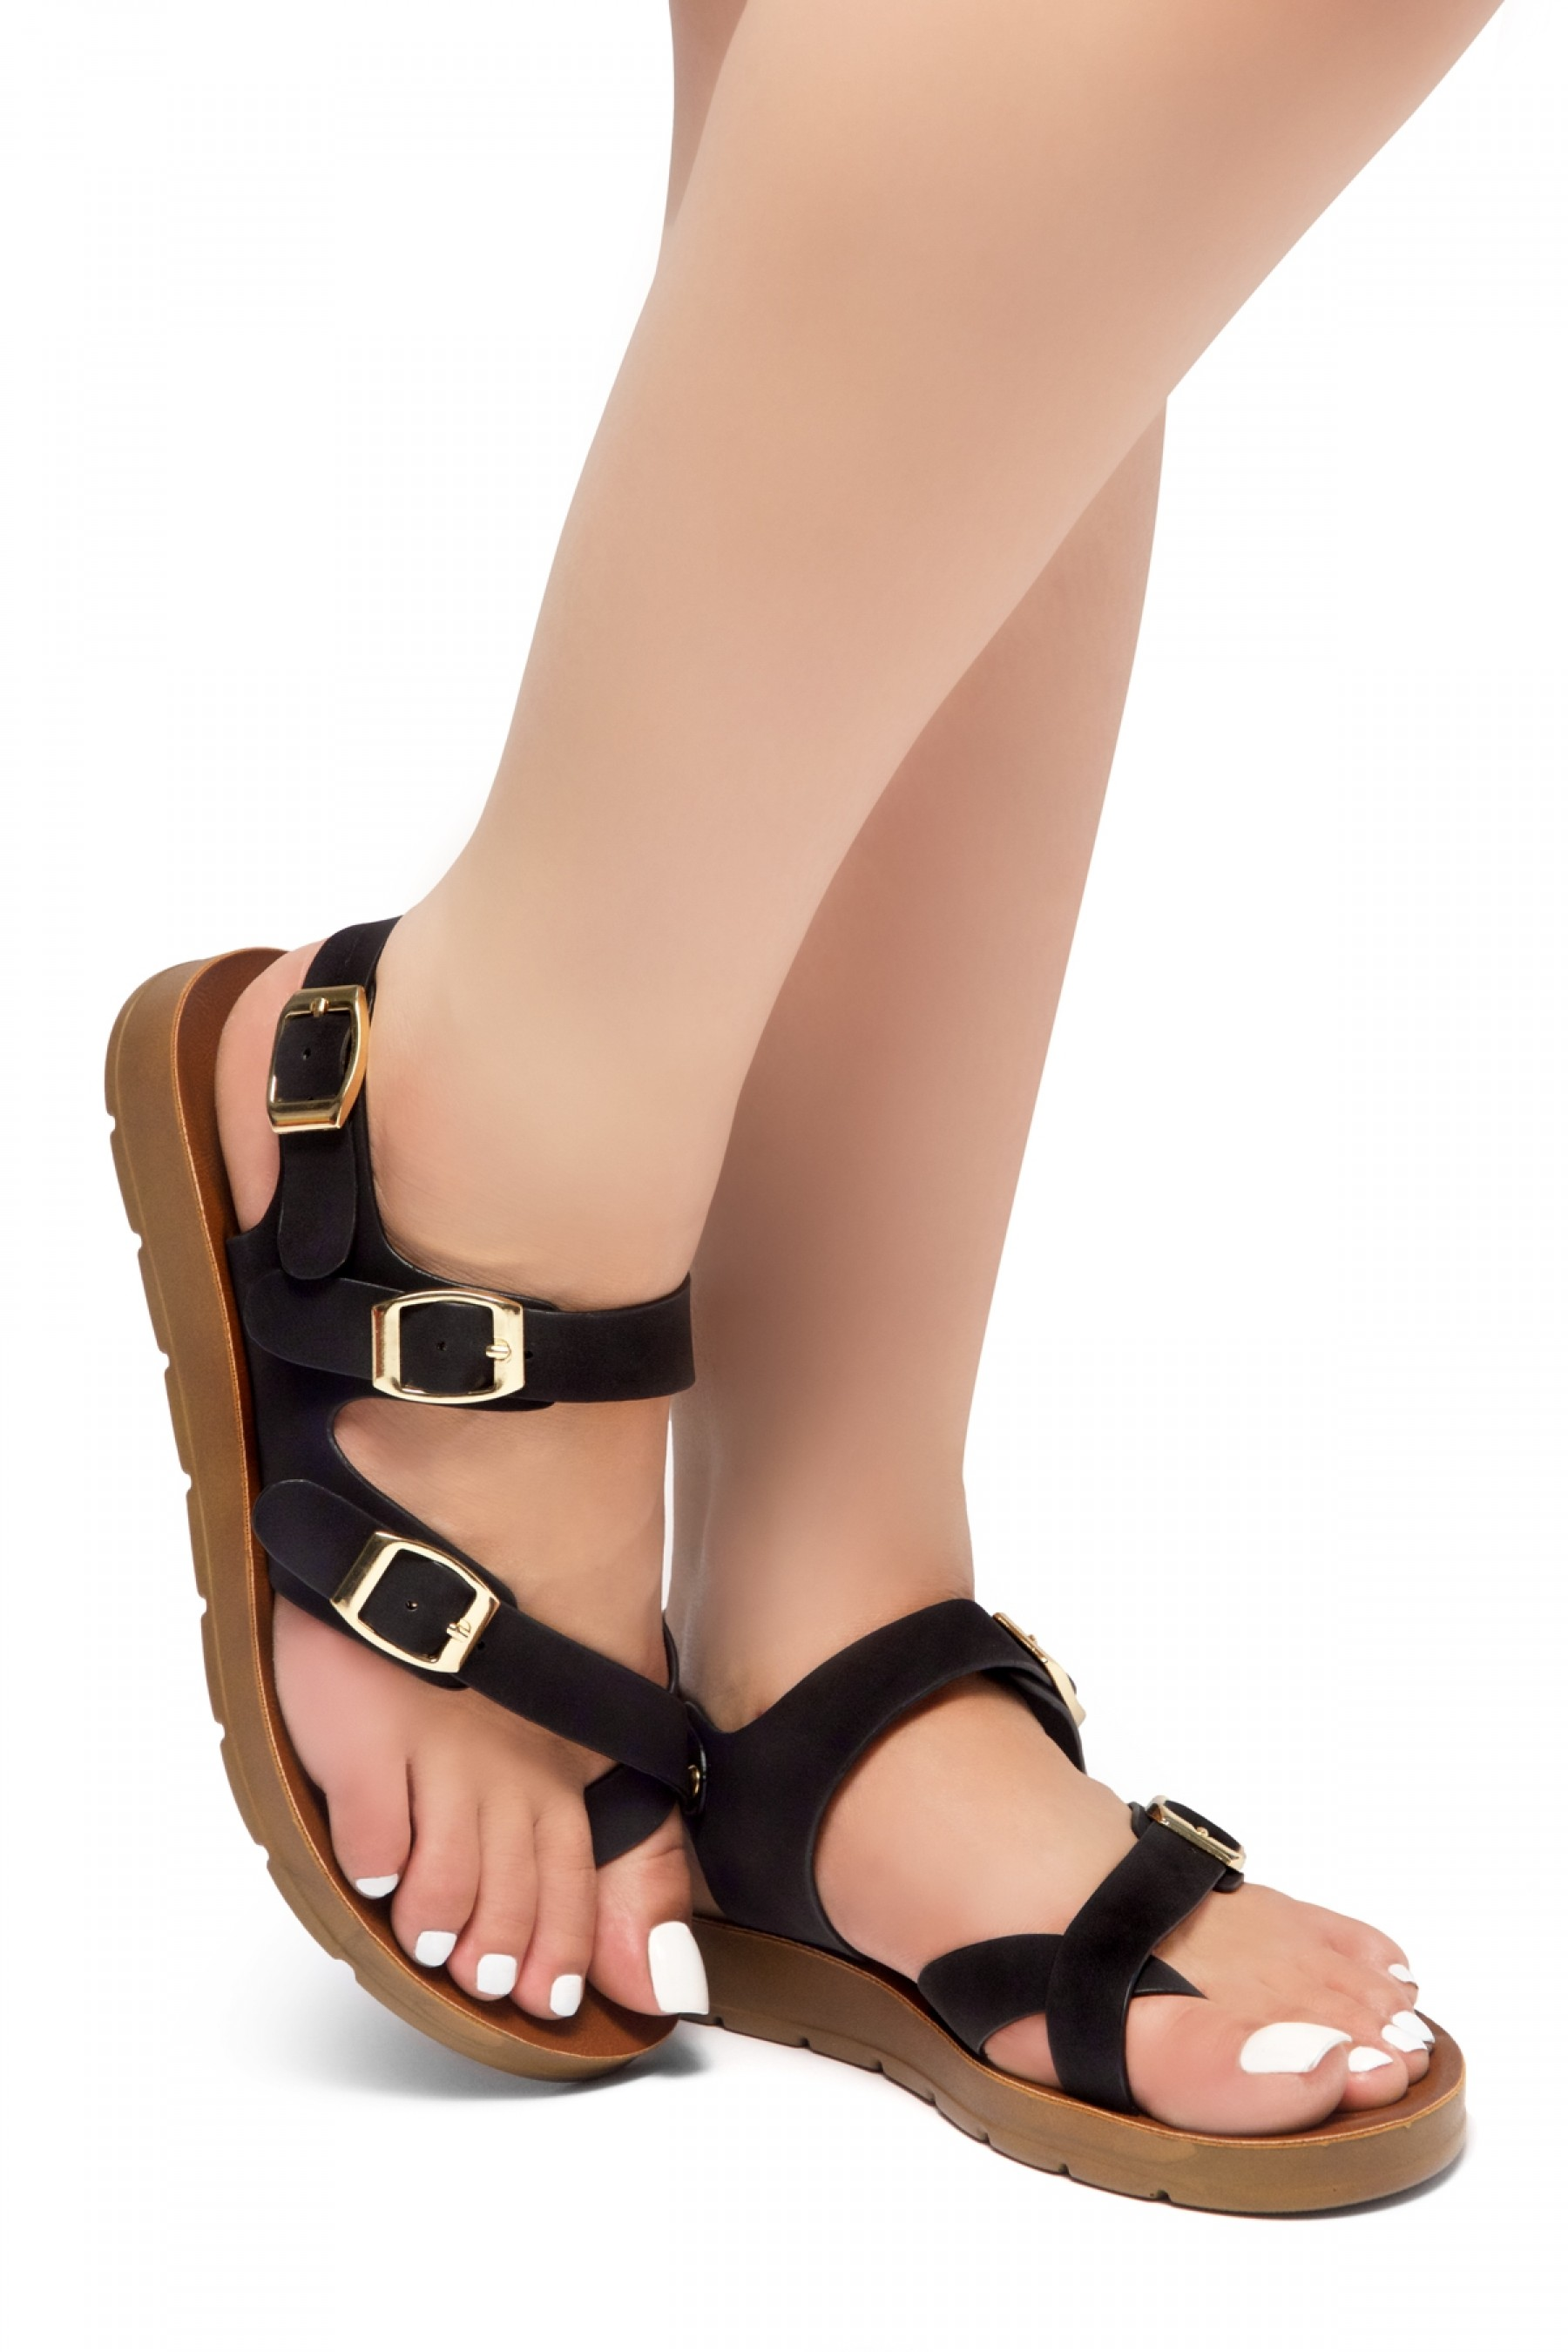 Shoe Land Women's Manmade NOLITA(SL)- Flat Sandal with buckle accents(1831/Black)